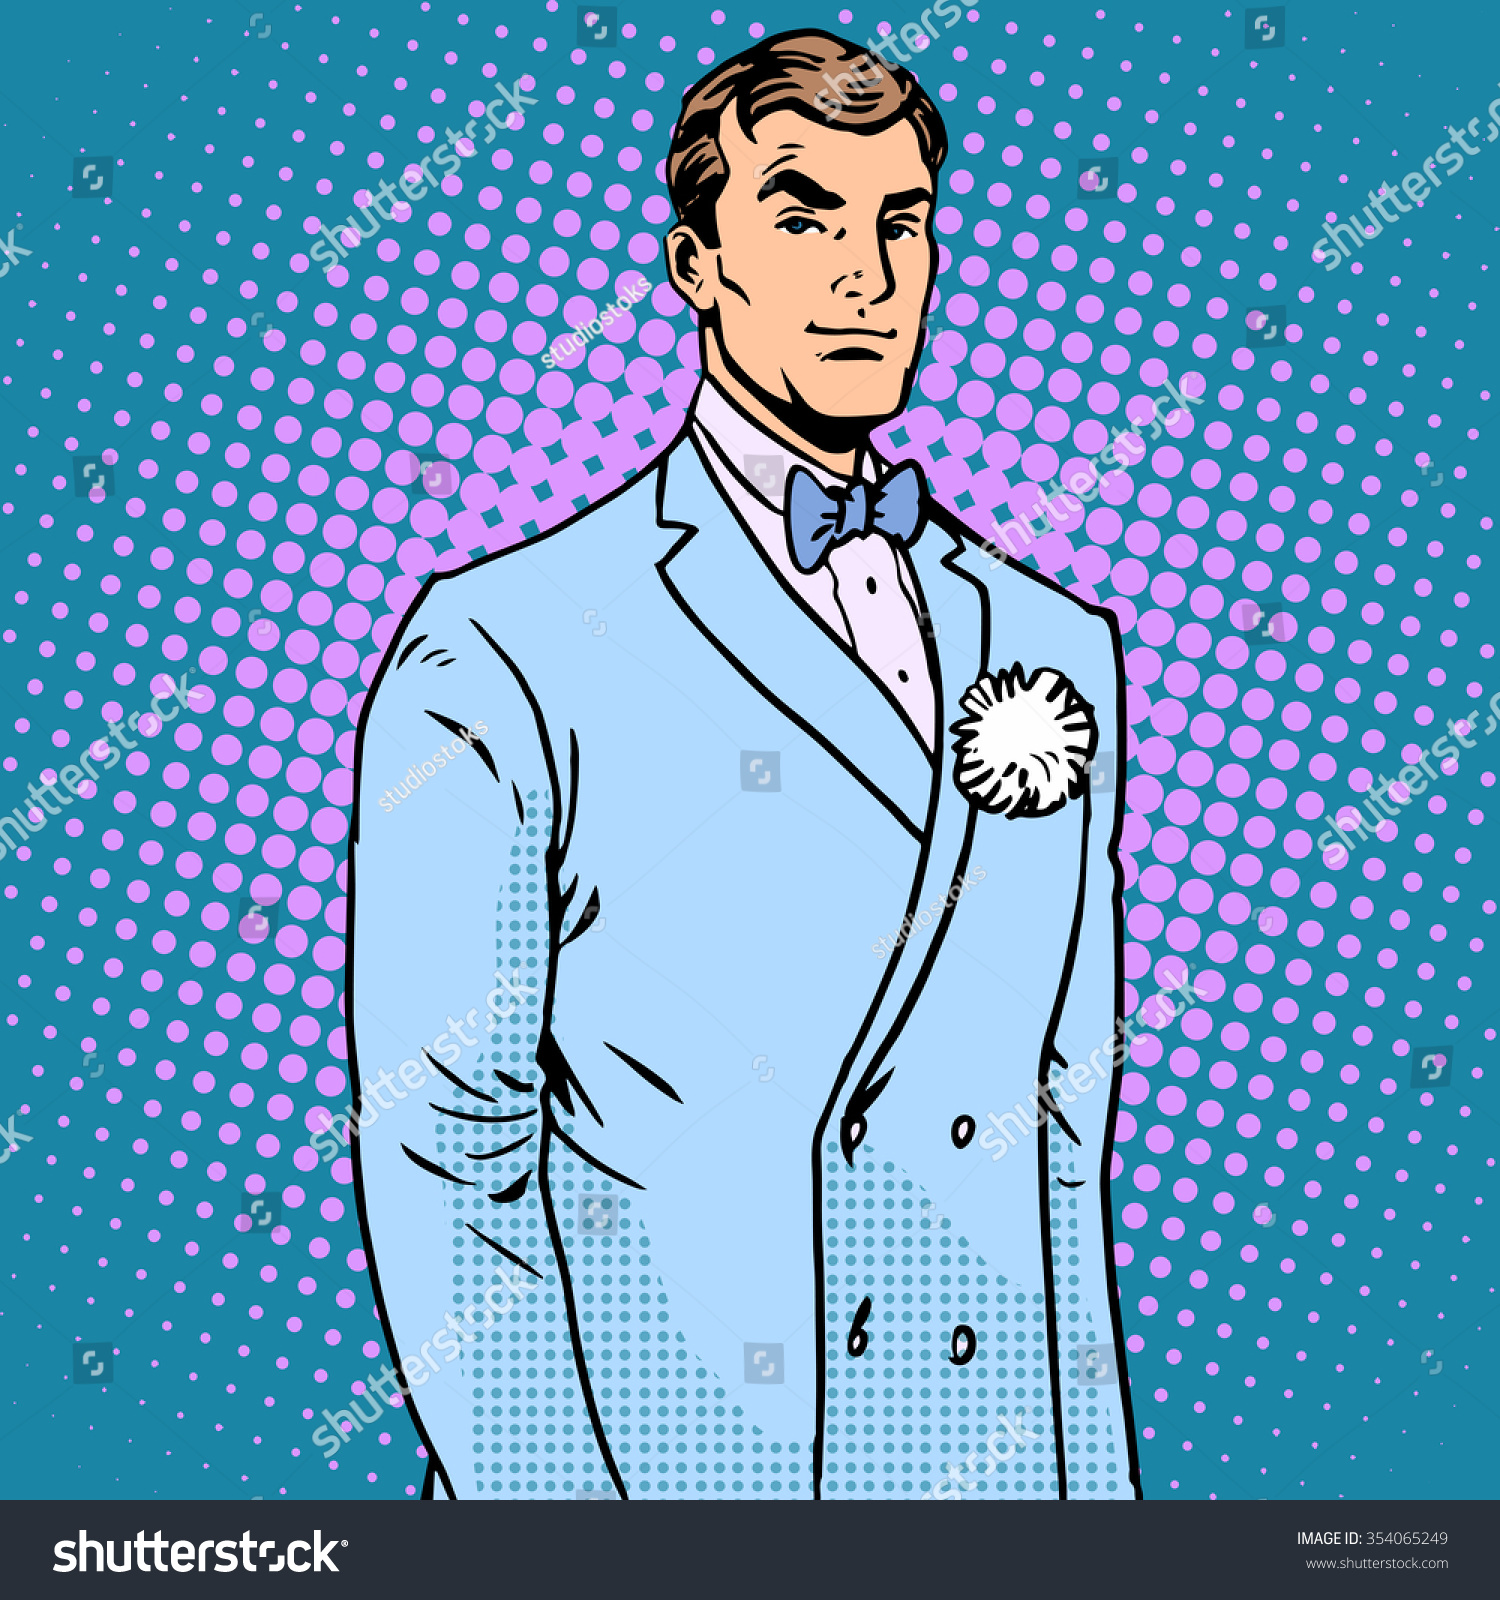 Groom Wedding Suit Pop Art Retro Stock Photo (Photo, Vector ...